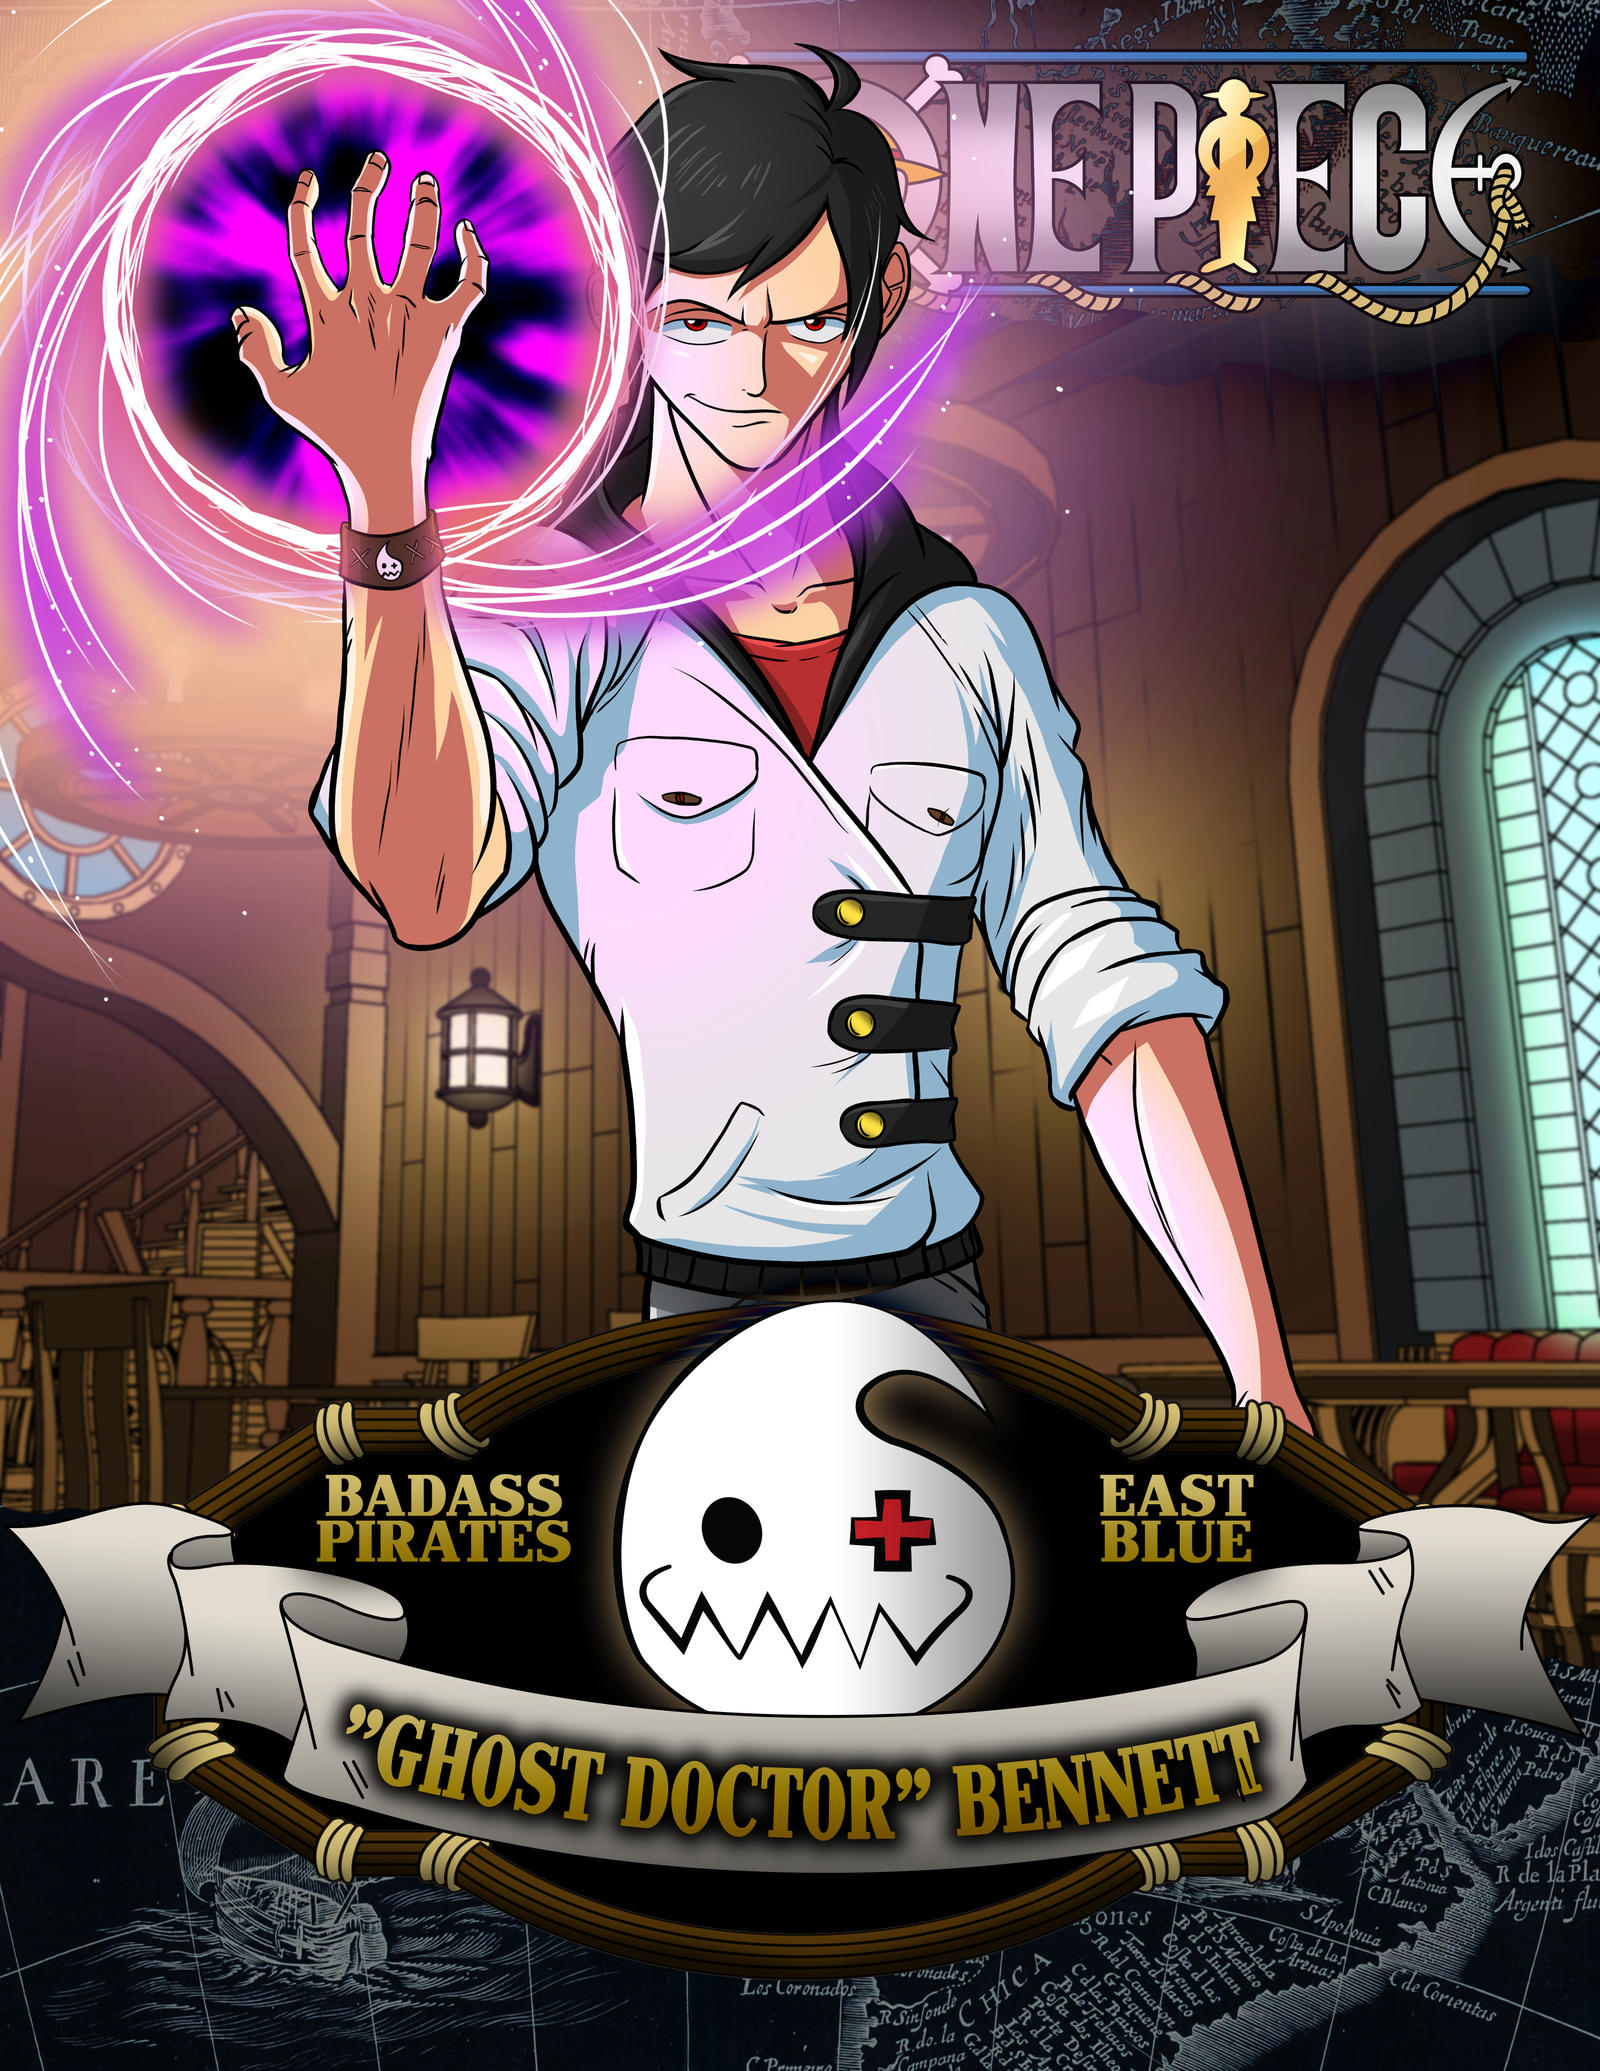 SPECTRUM NEXUS Your Nexus to Anime and Manga